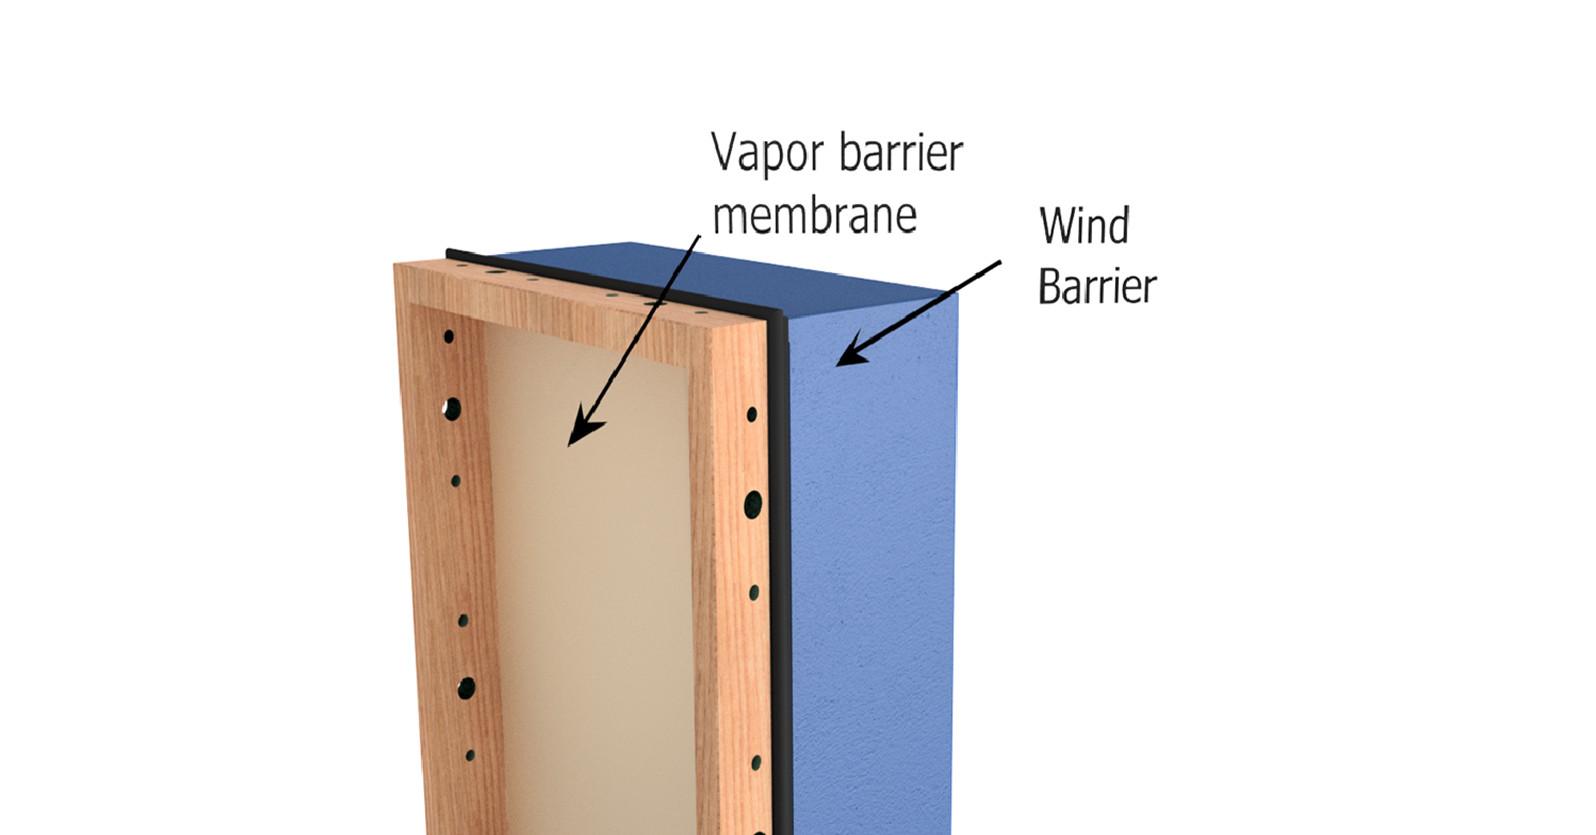 Vapor and wind barrier